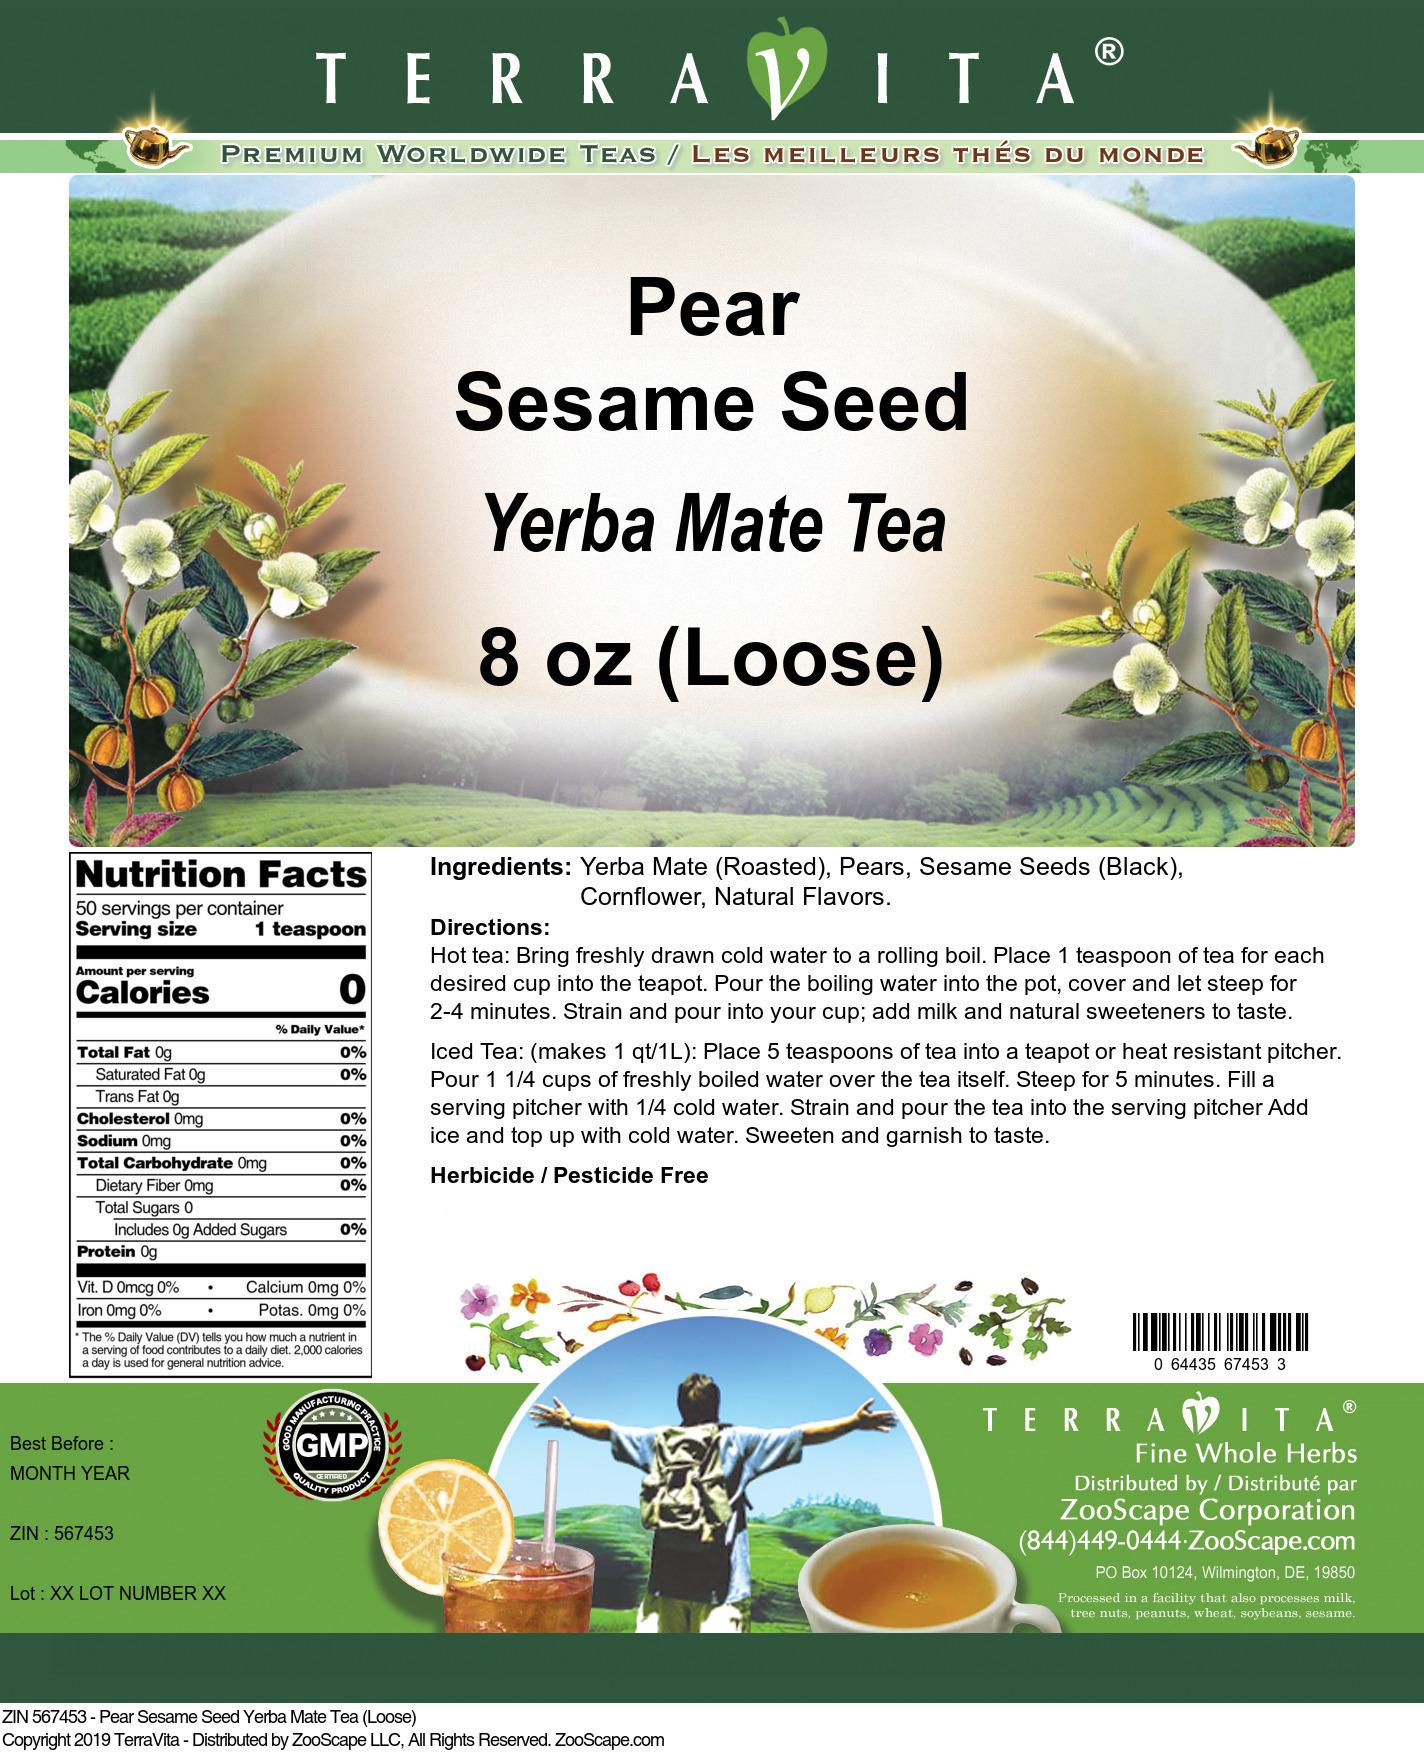 Pear Sesame Seed Yerba Mate